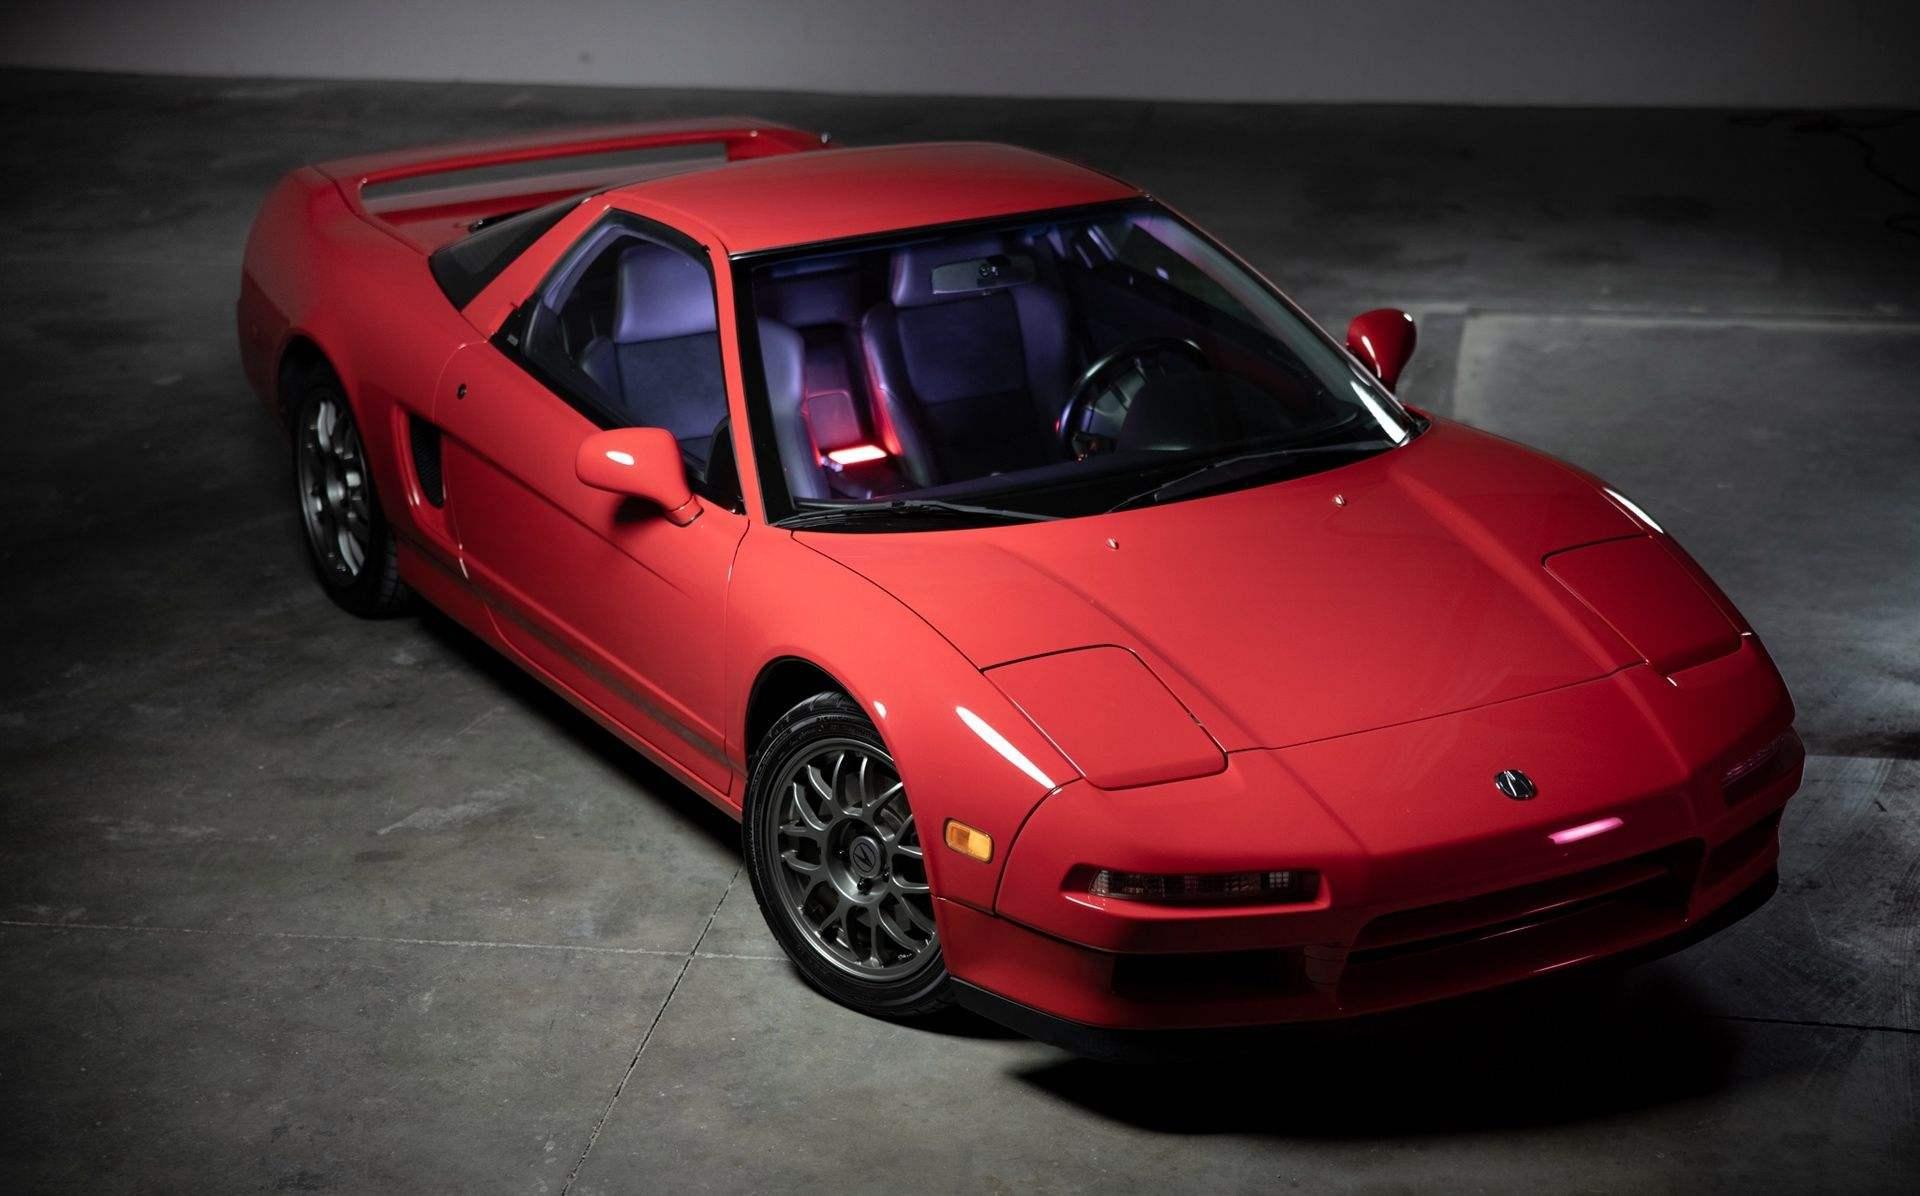 1998_Honda_NSX_Zanardi_Edition_sale_0021